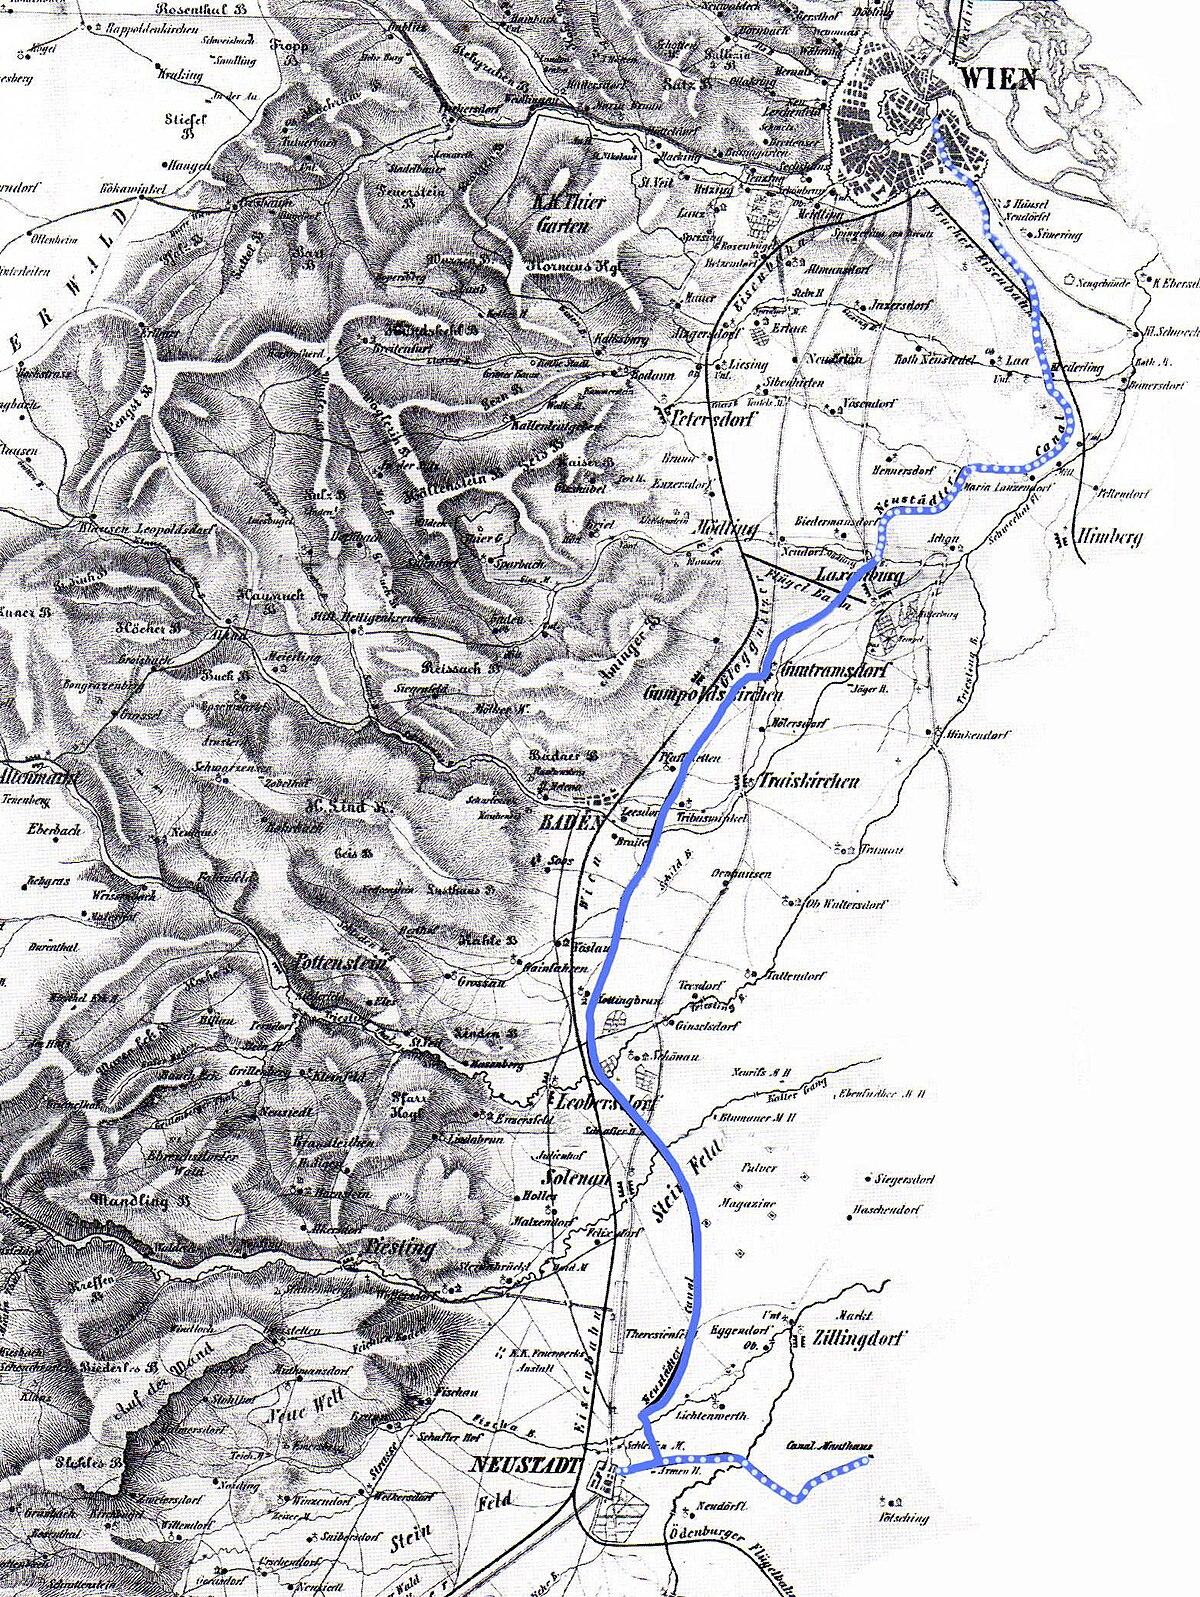 Wiener Neustädter Kanal – Wikipedia